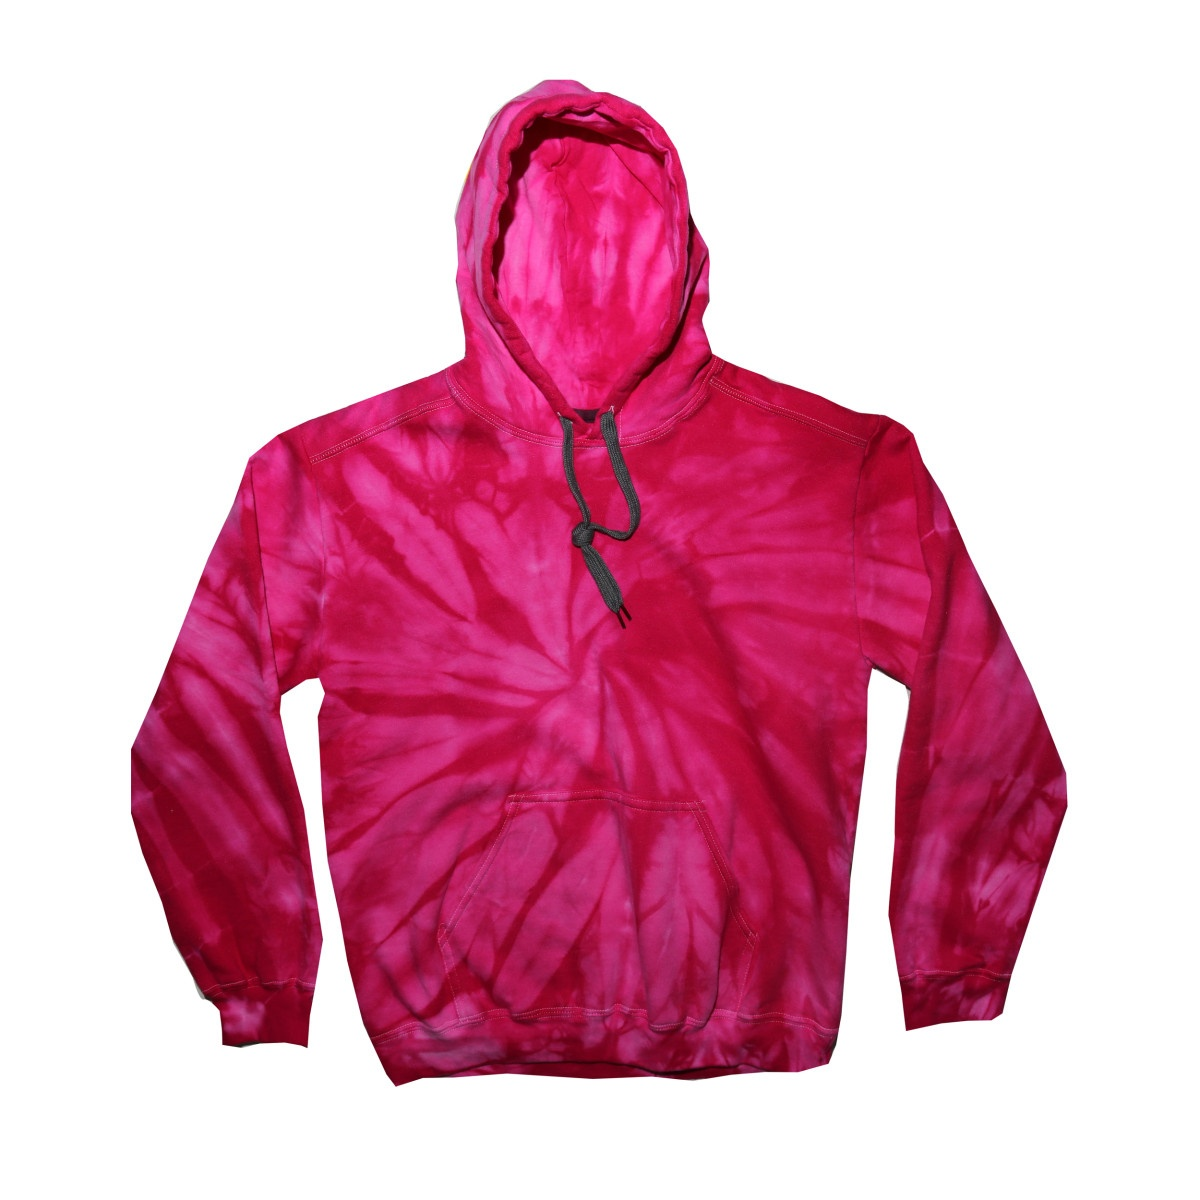 tie dye hoodie amazon photo - 1